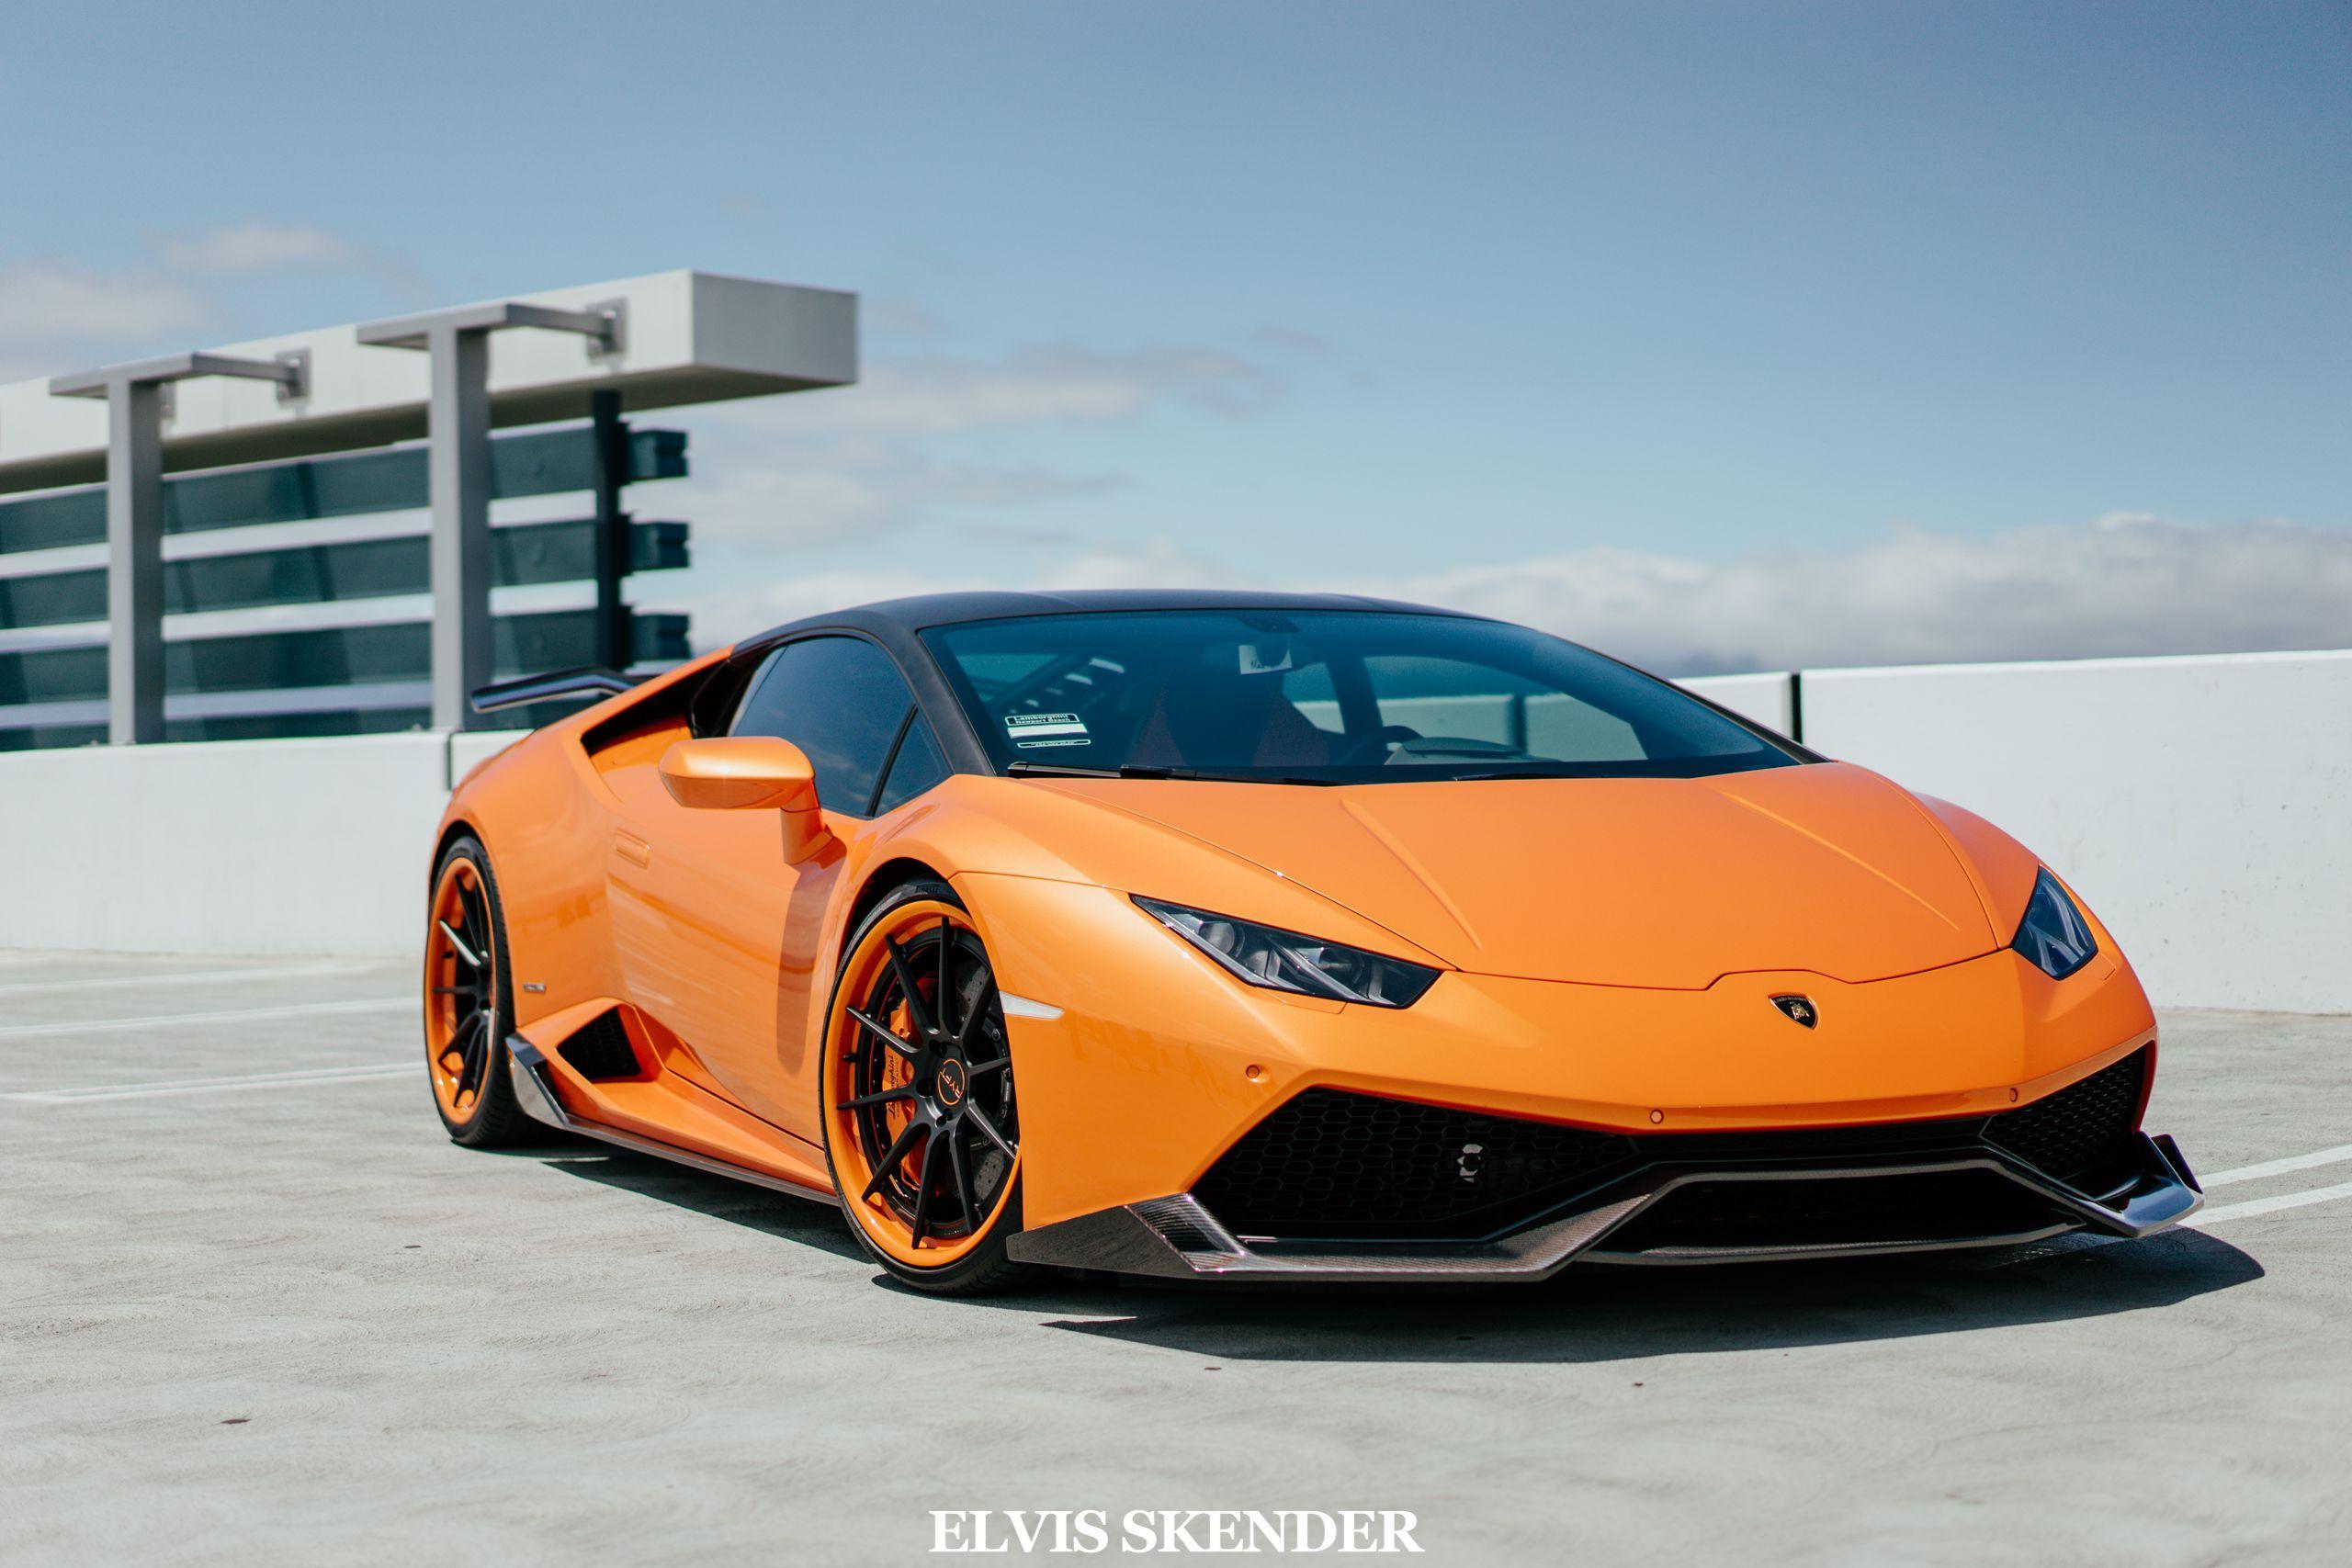 53bb209099cbef2241e215563929c862 Extraordinary Lamborghini Huracan Need for Speed Cars Trend